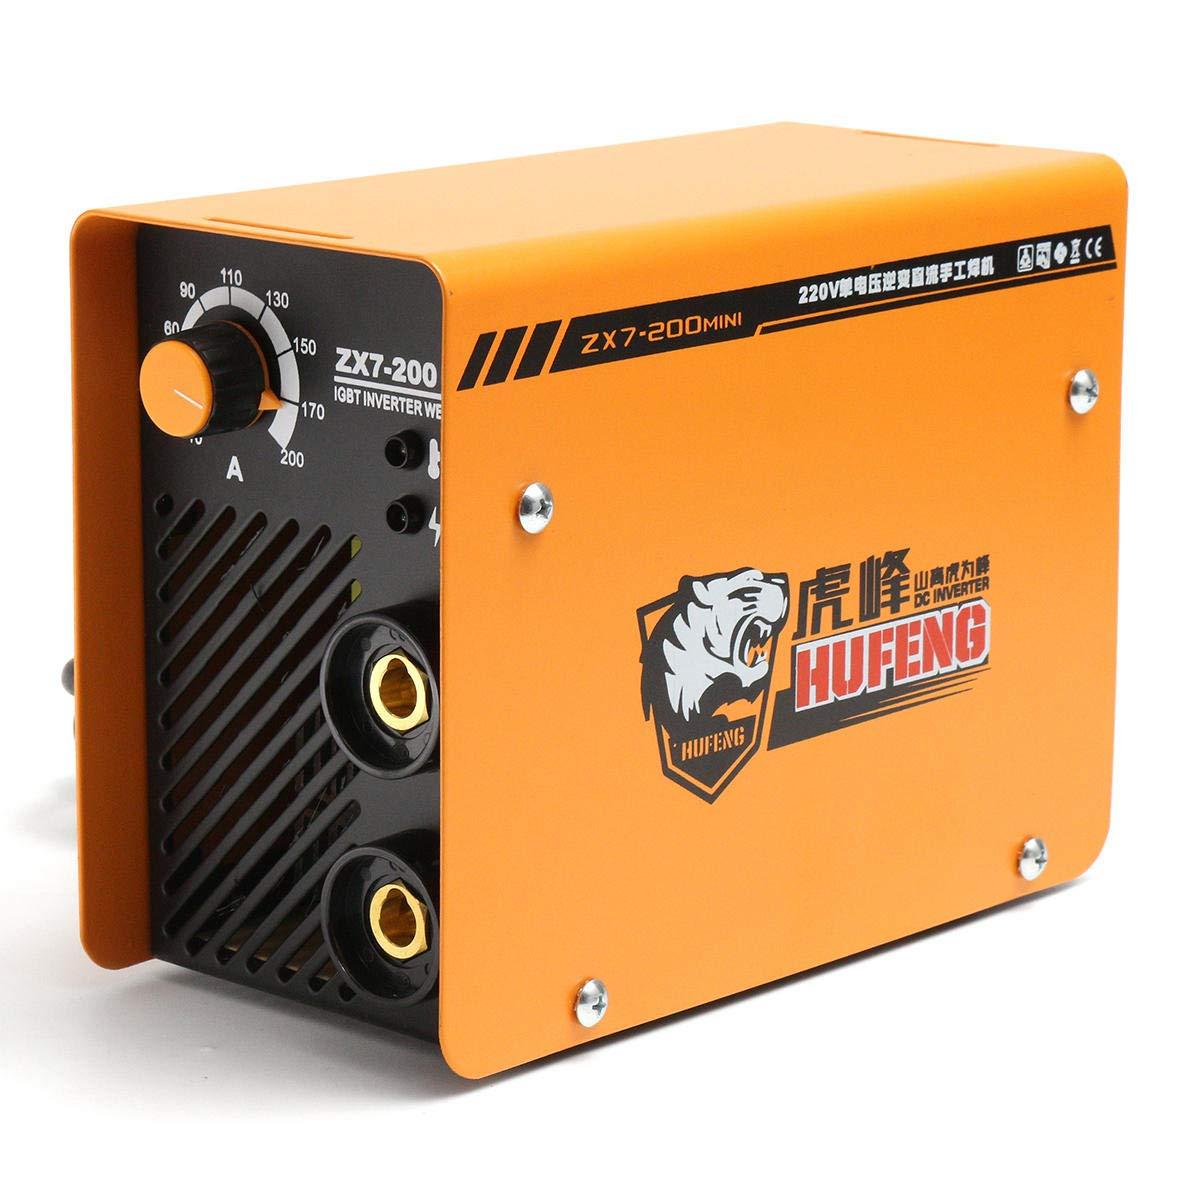 ZX7-200 Mini Portable IGBT Full Copper Core DC Inverter 200A ARC Welding Machine